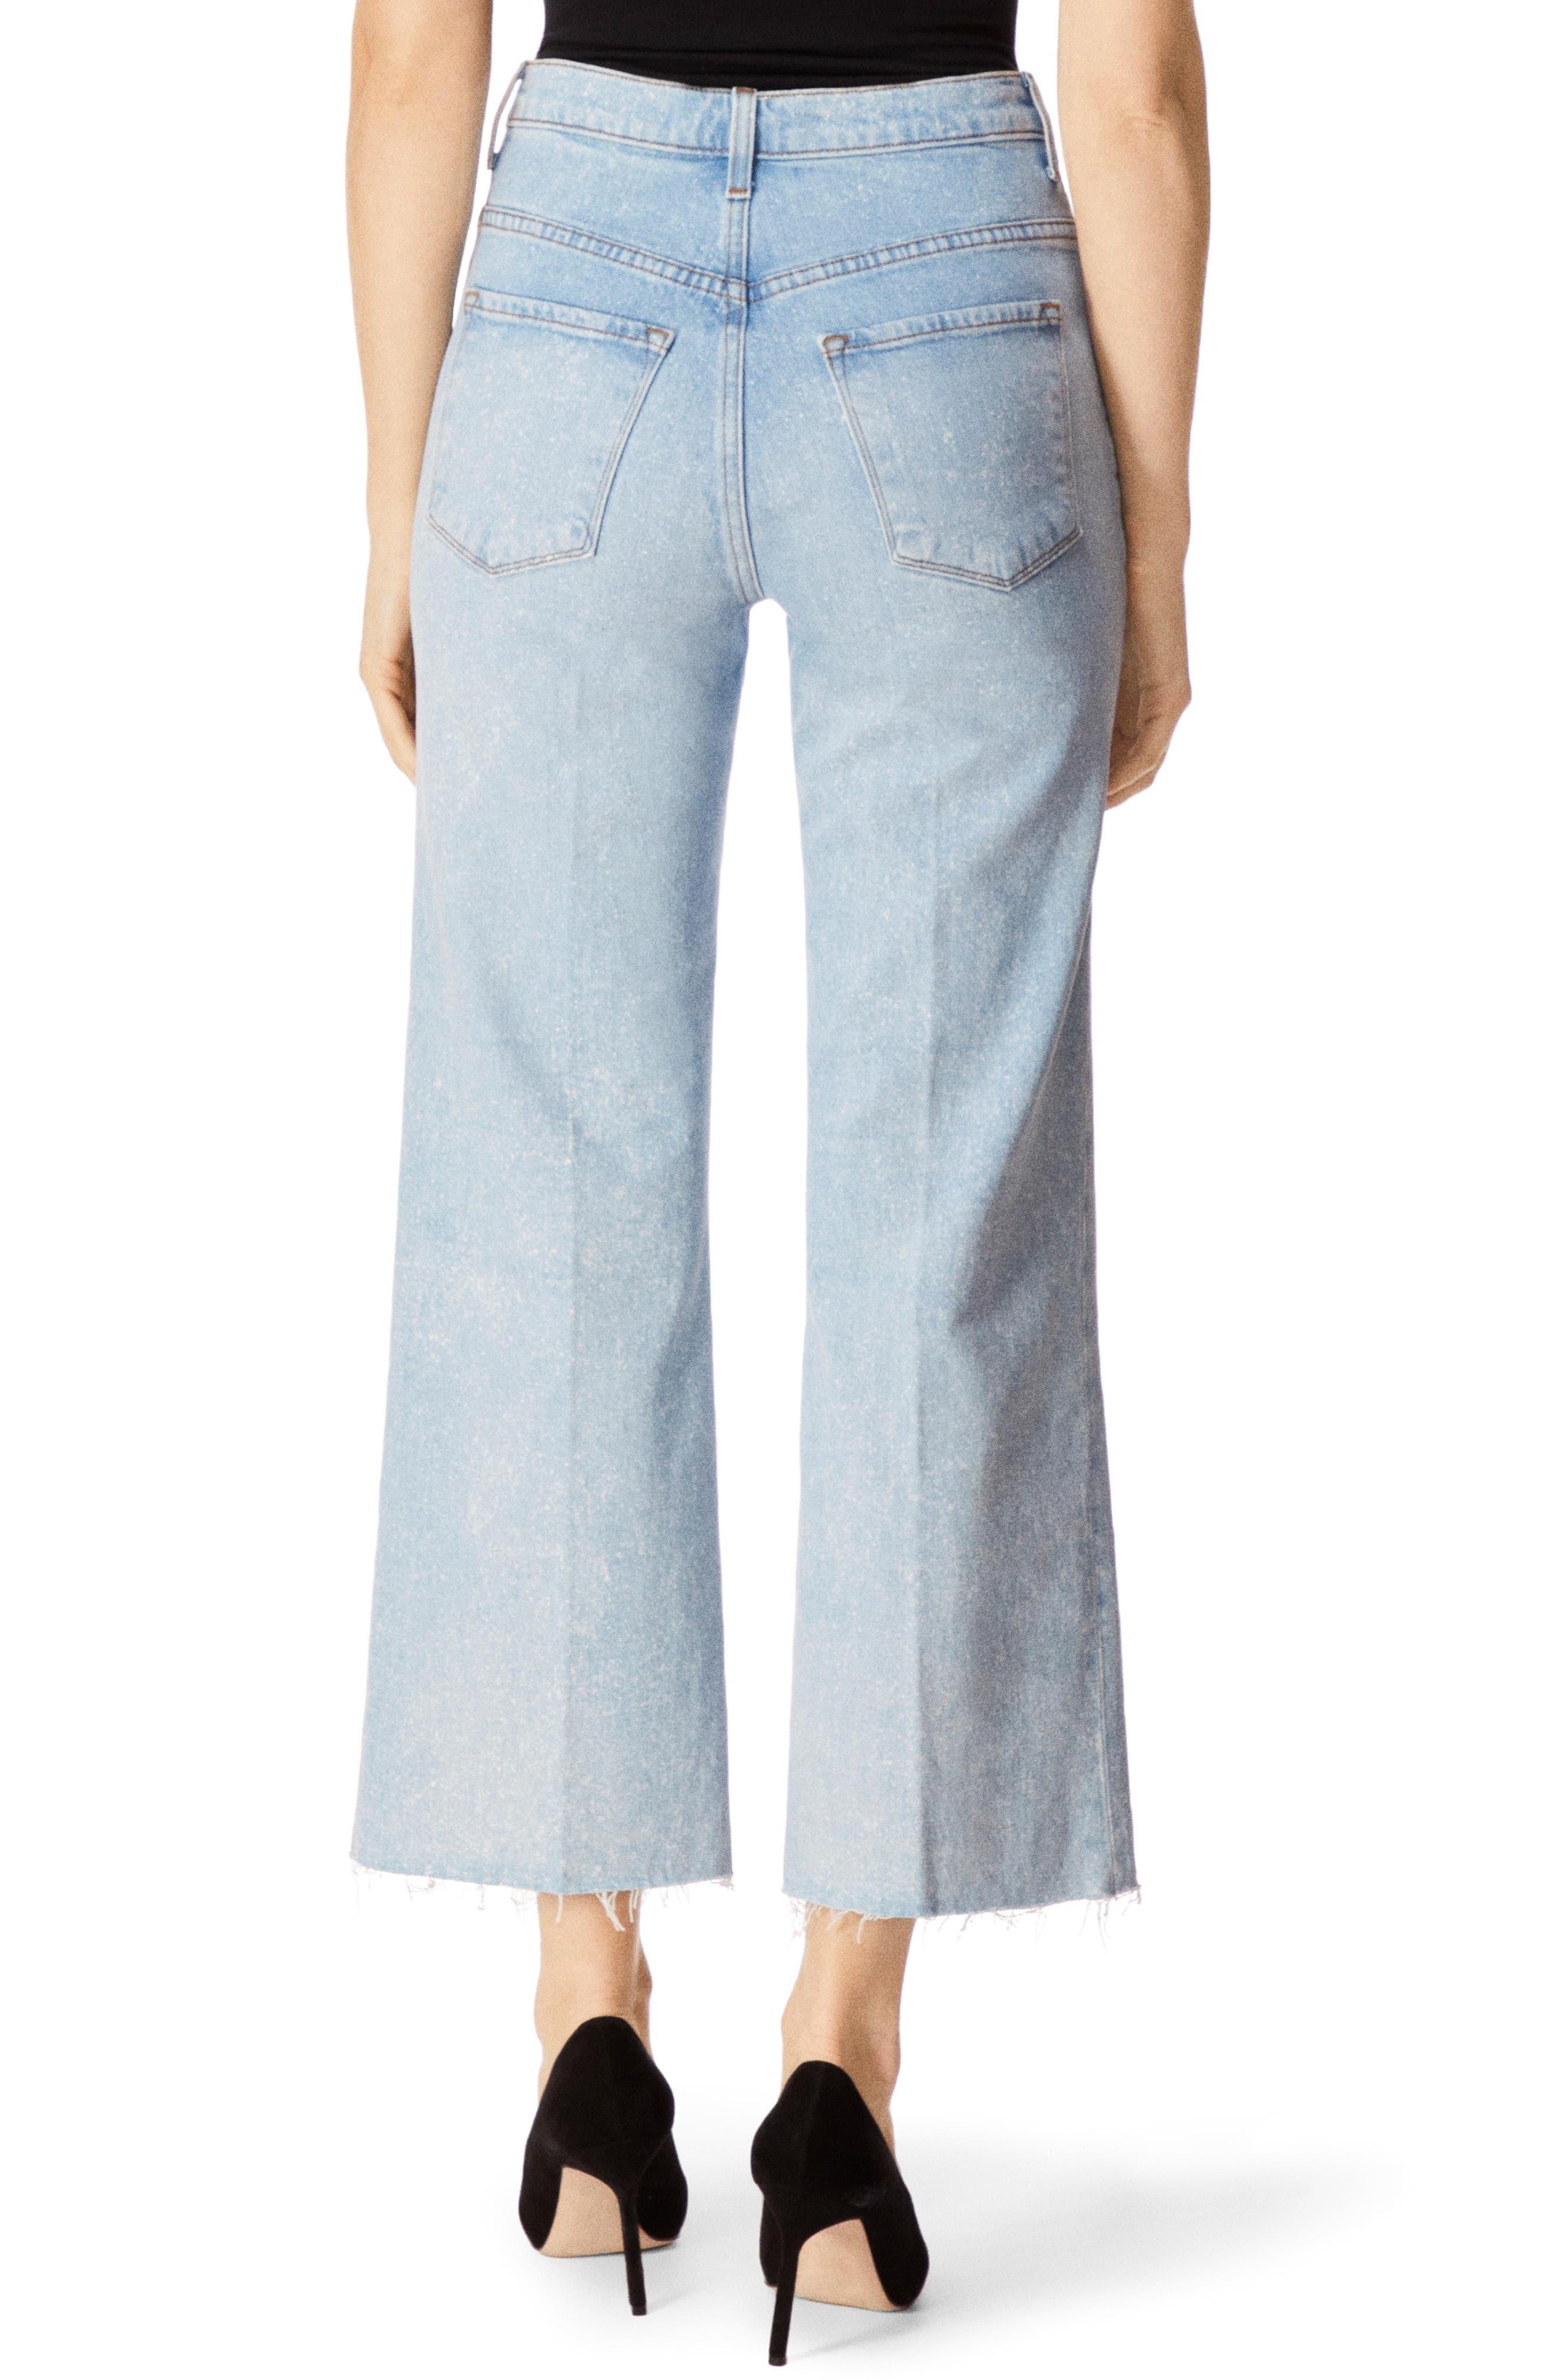 J BRAND, Joan High Waist Crop Wide Leg Jeans, Alternate thumbnail 2, color, AERGLO